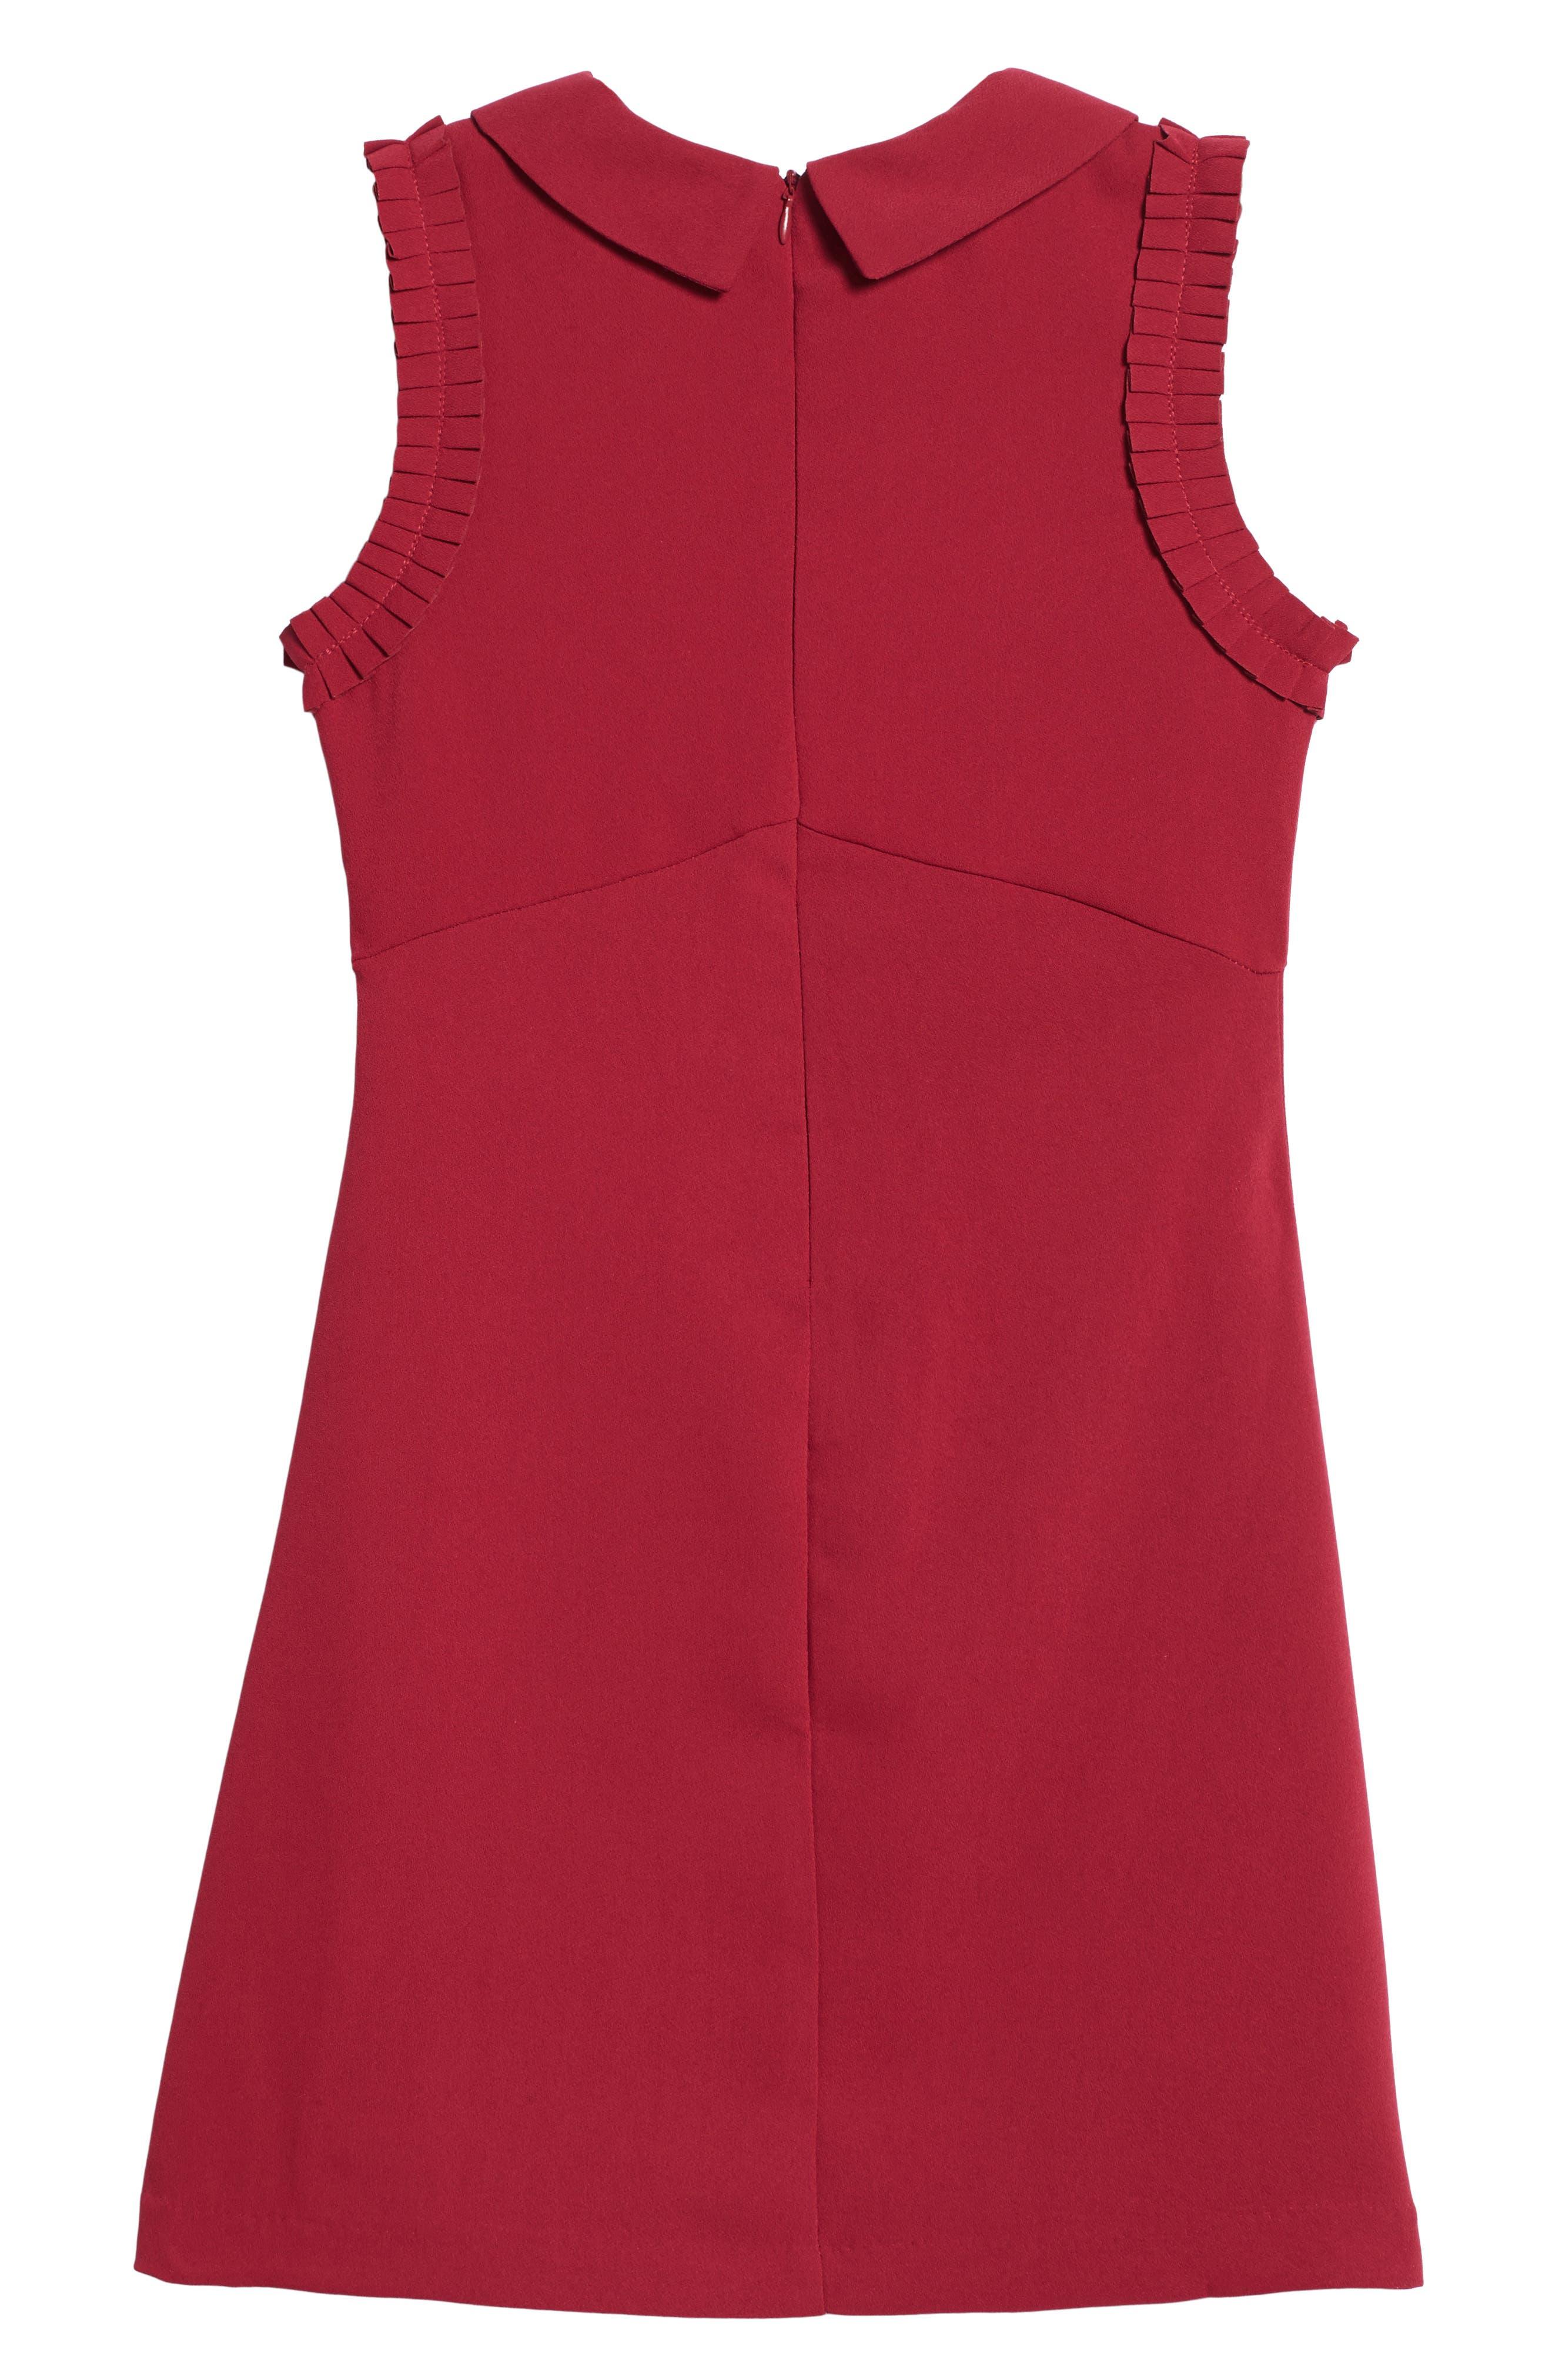 Point Collar Dress,                             Alternate thumbnail 2, color,